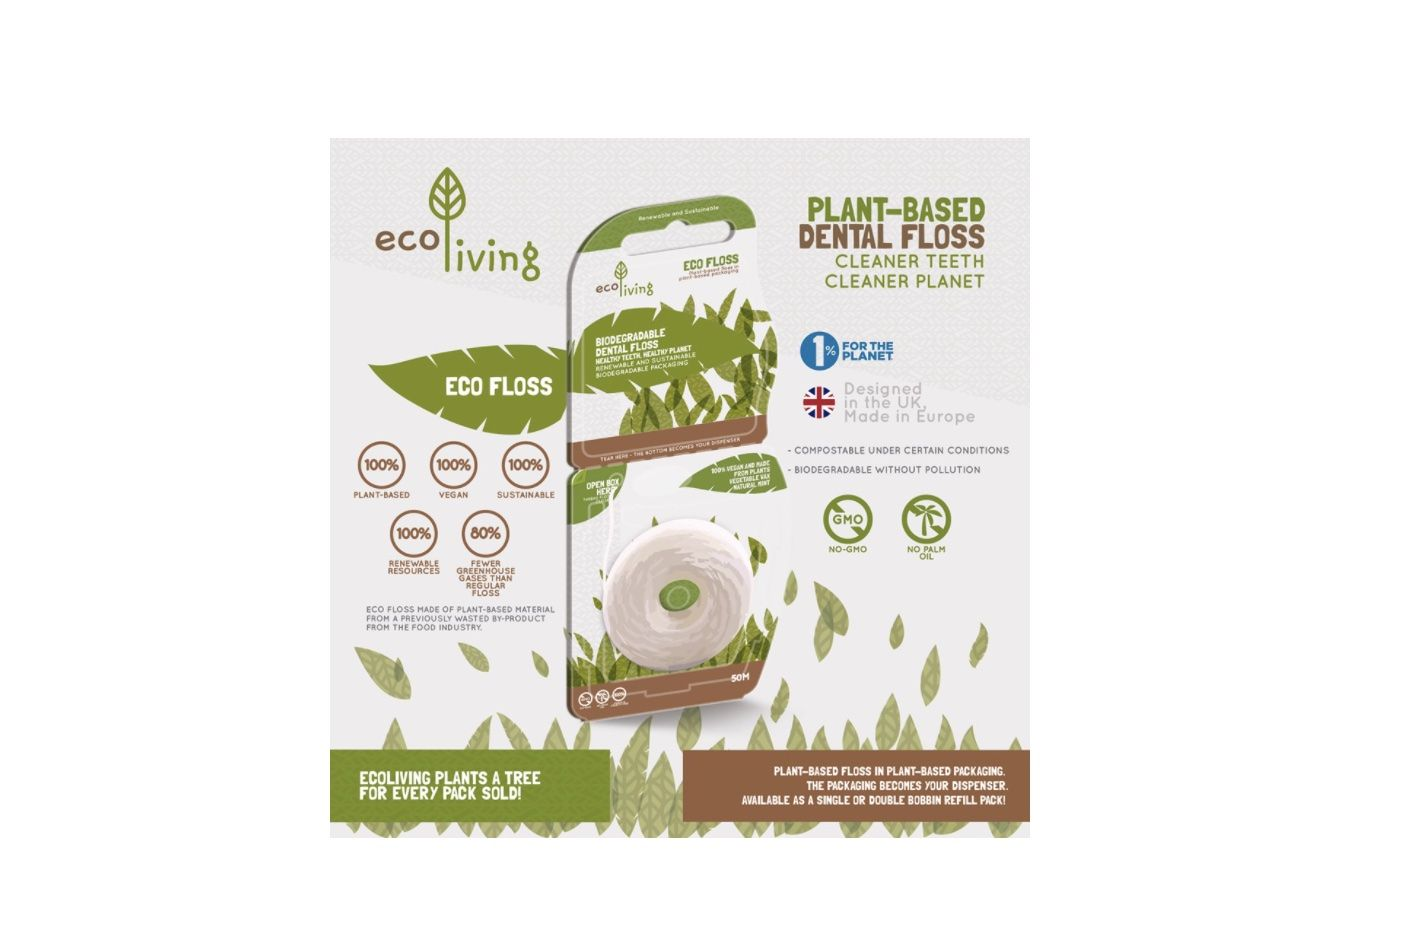 eco friendly toiletries ecoliving floss